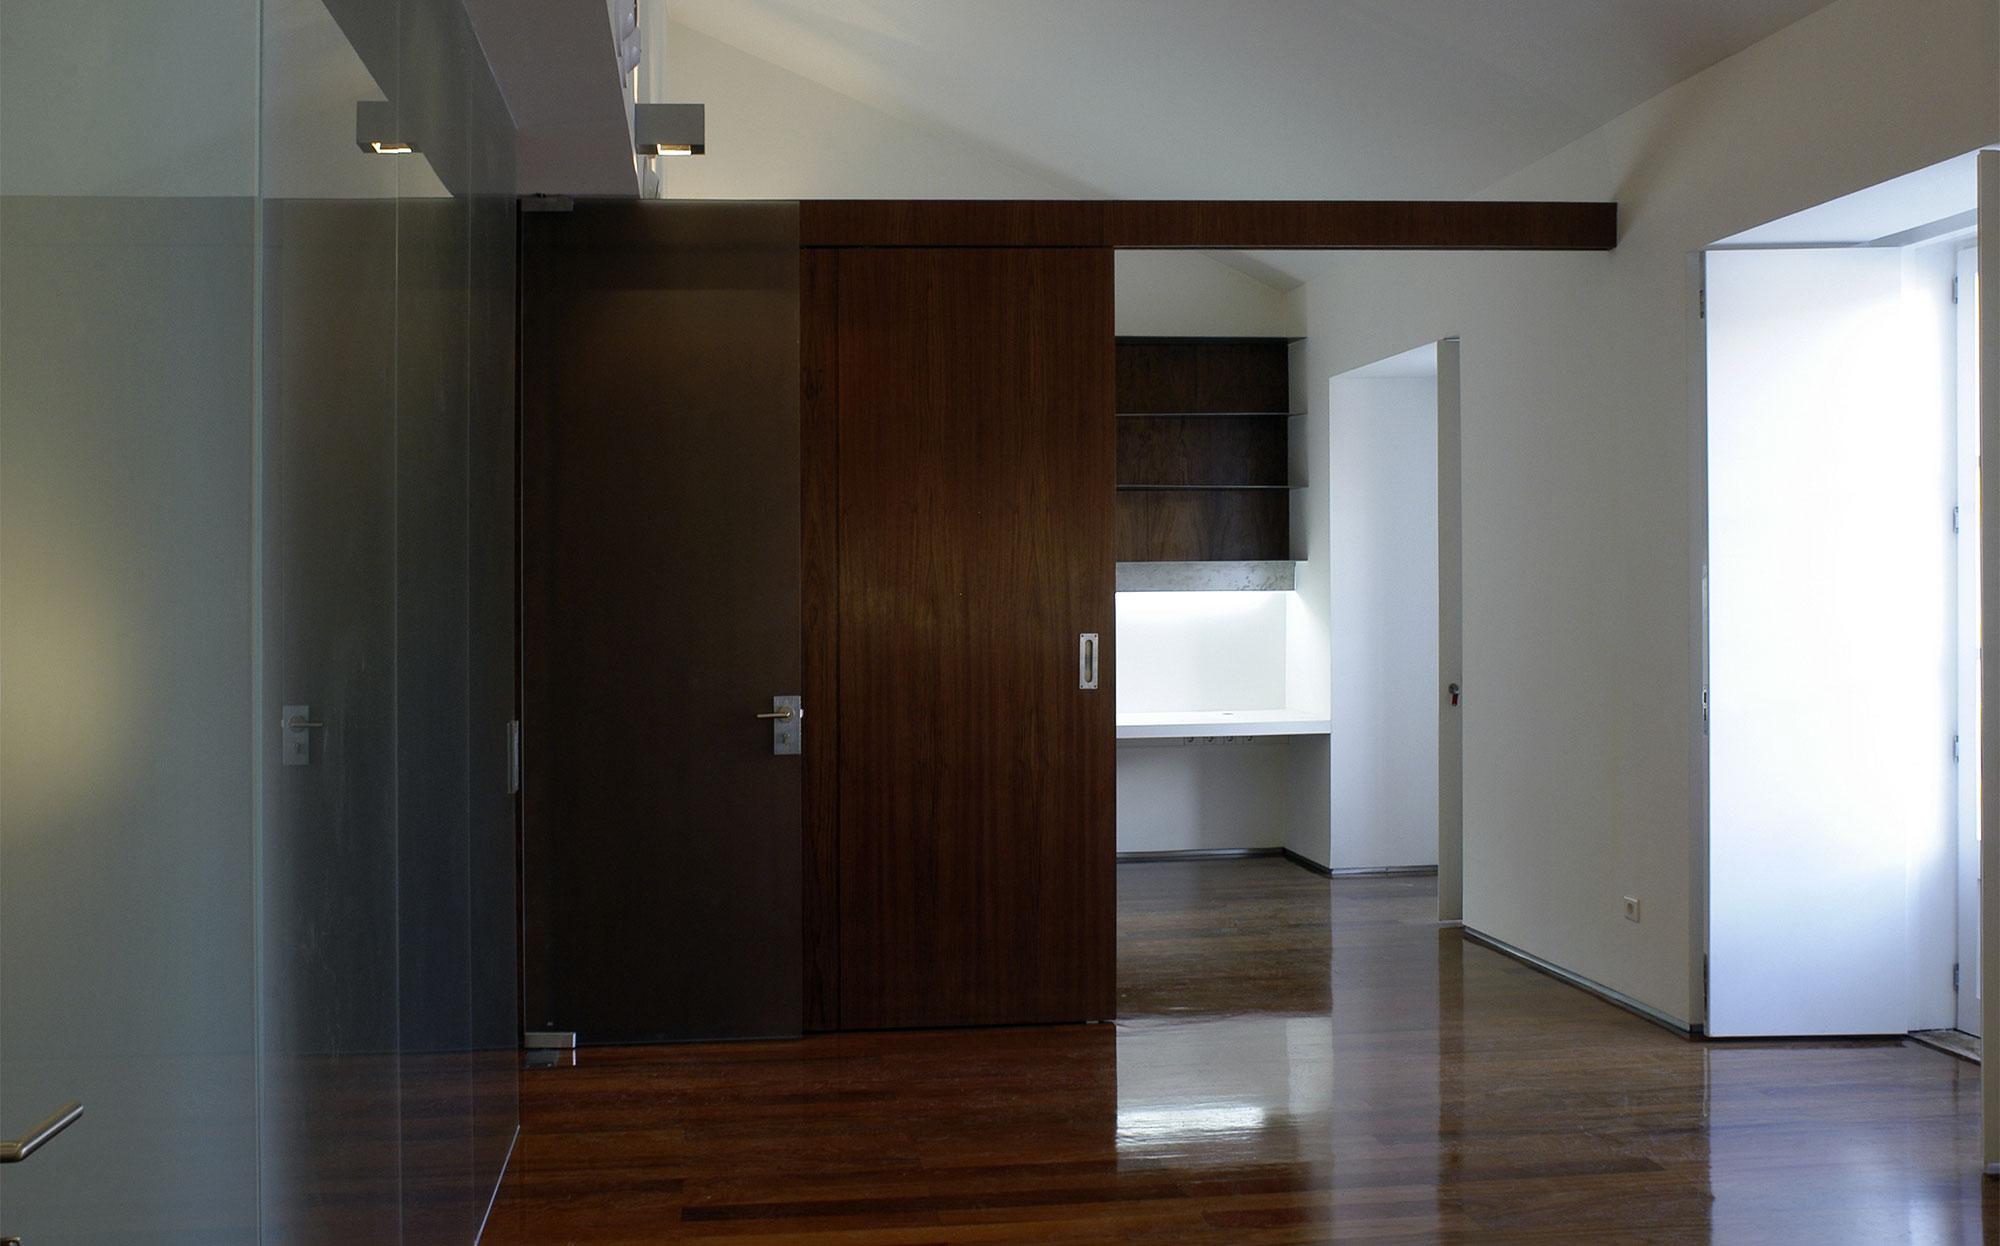 Projecto de Arquitectura Loja e Oficina | Arquitectura, Arquitecto Lisboa, Projecto arquitectura Lisboa, Arquitecto Lisboa, Arquitecto, Gabinete de Arquitetura Lisboa